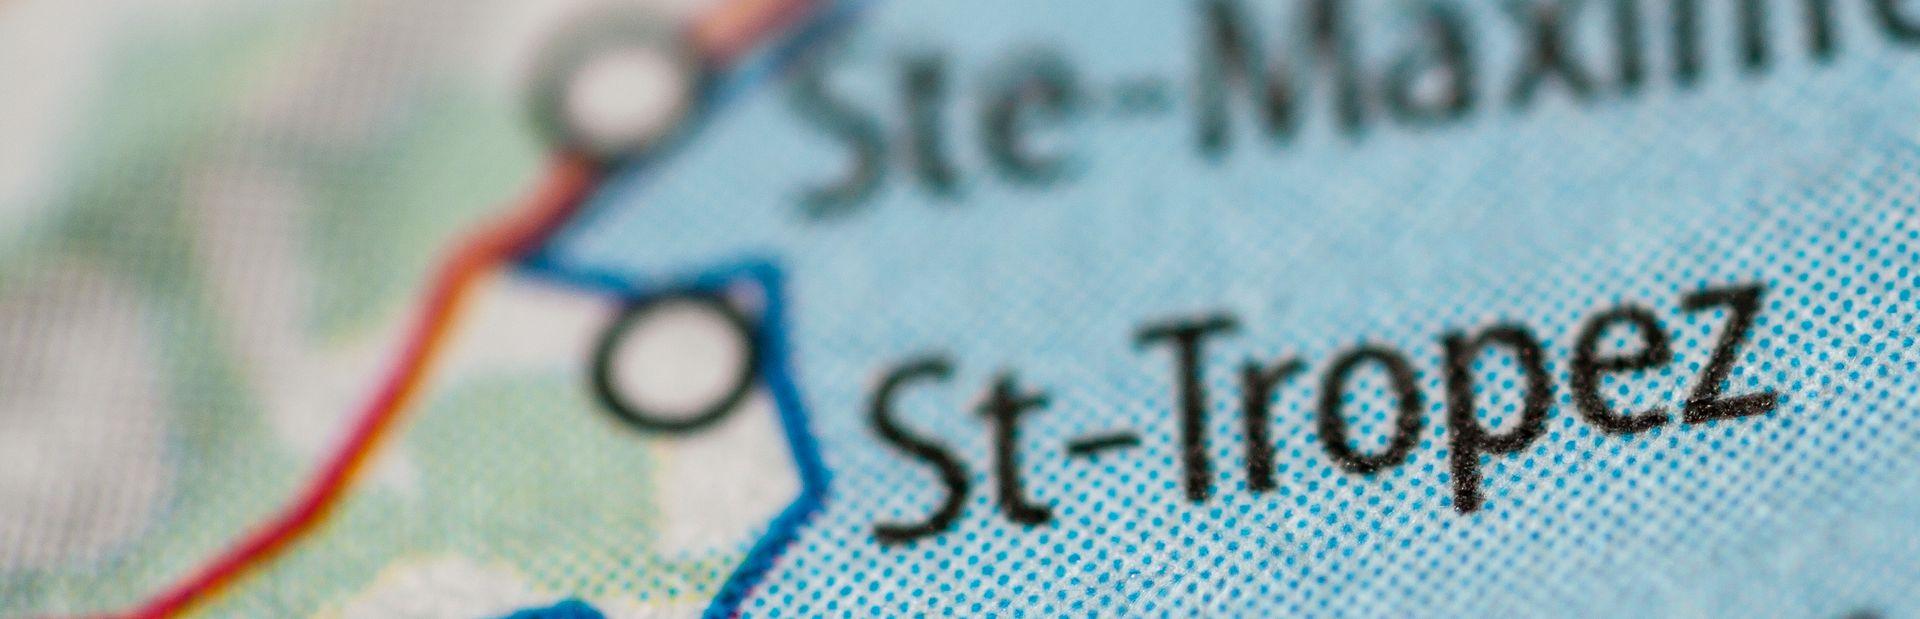 St Tropez interactive map